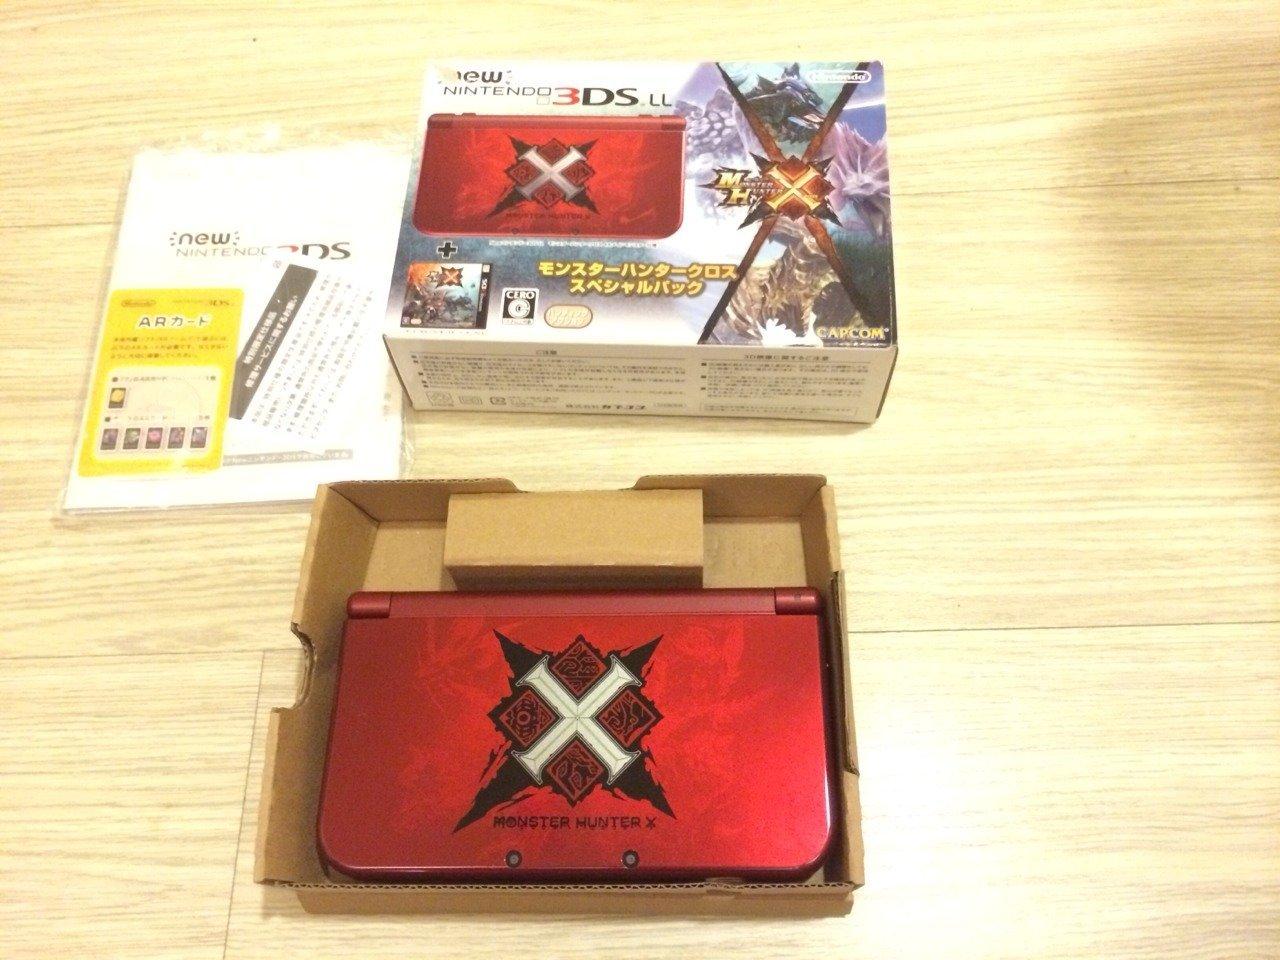 N3DS NEW 3DSLL 魔物獵人X 特仕機 獵人X 限定主機 同捆機 售8500